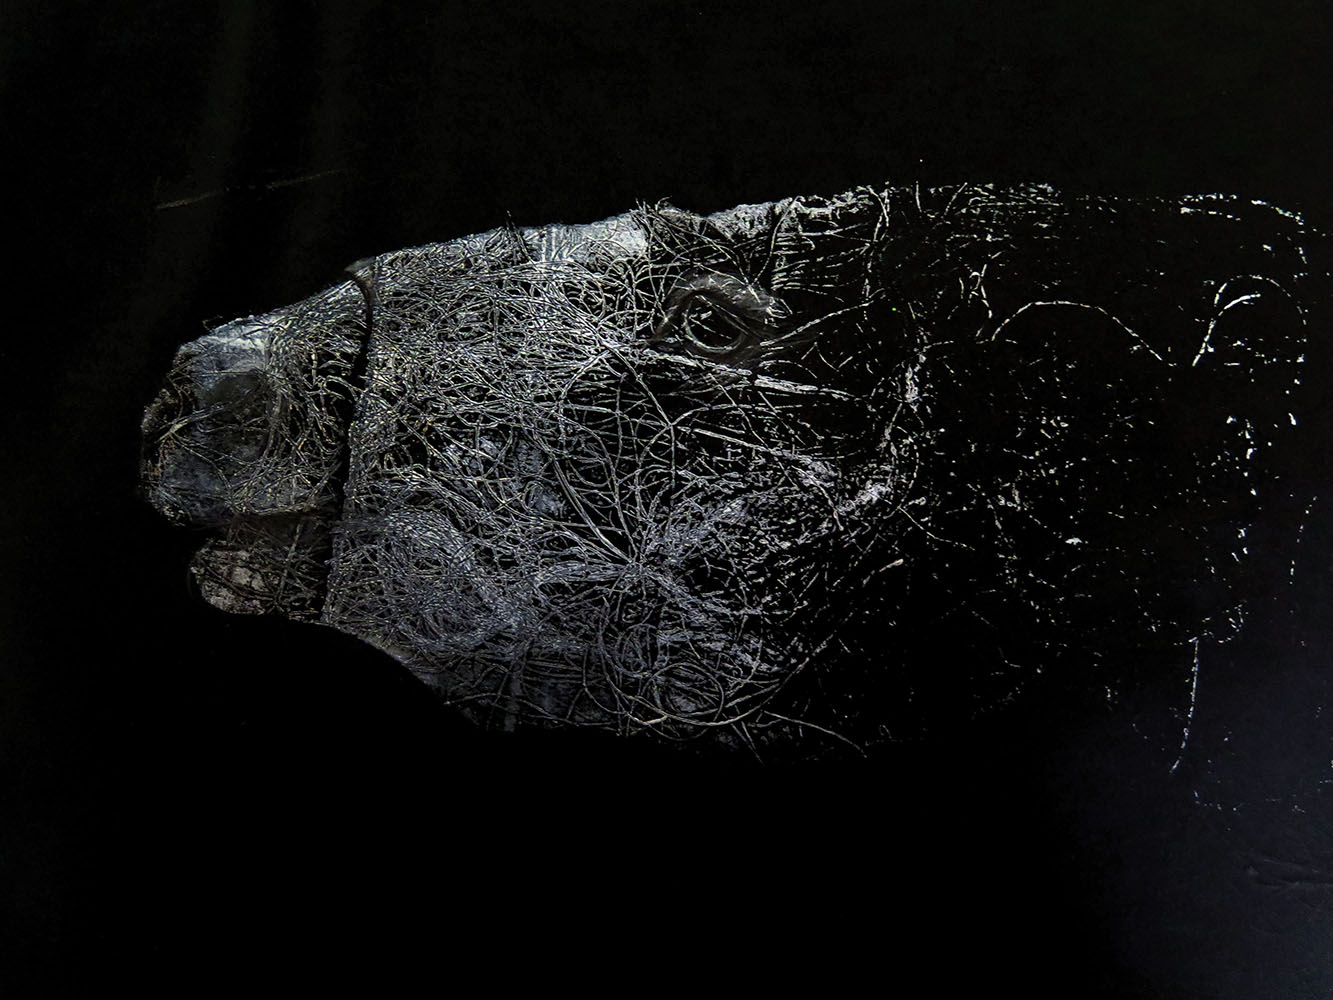 Pedro Pulido: El compromiso de la estética funcional